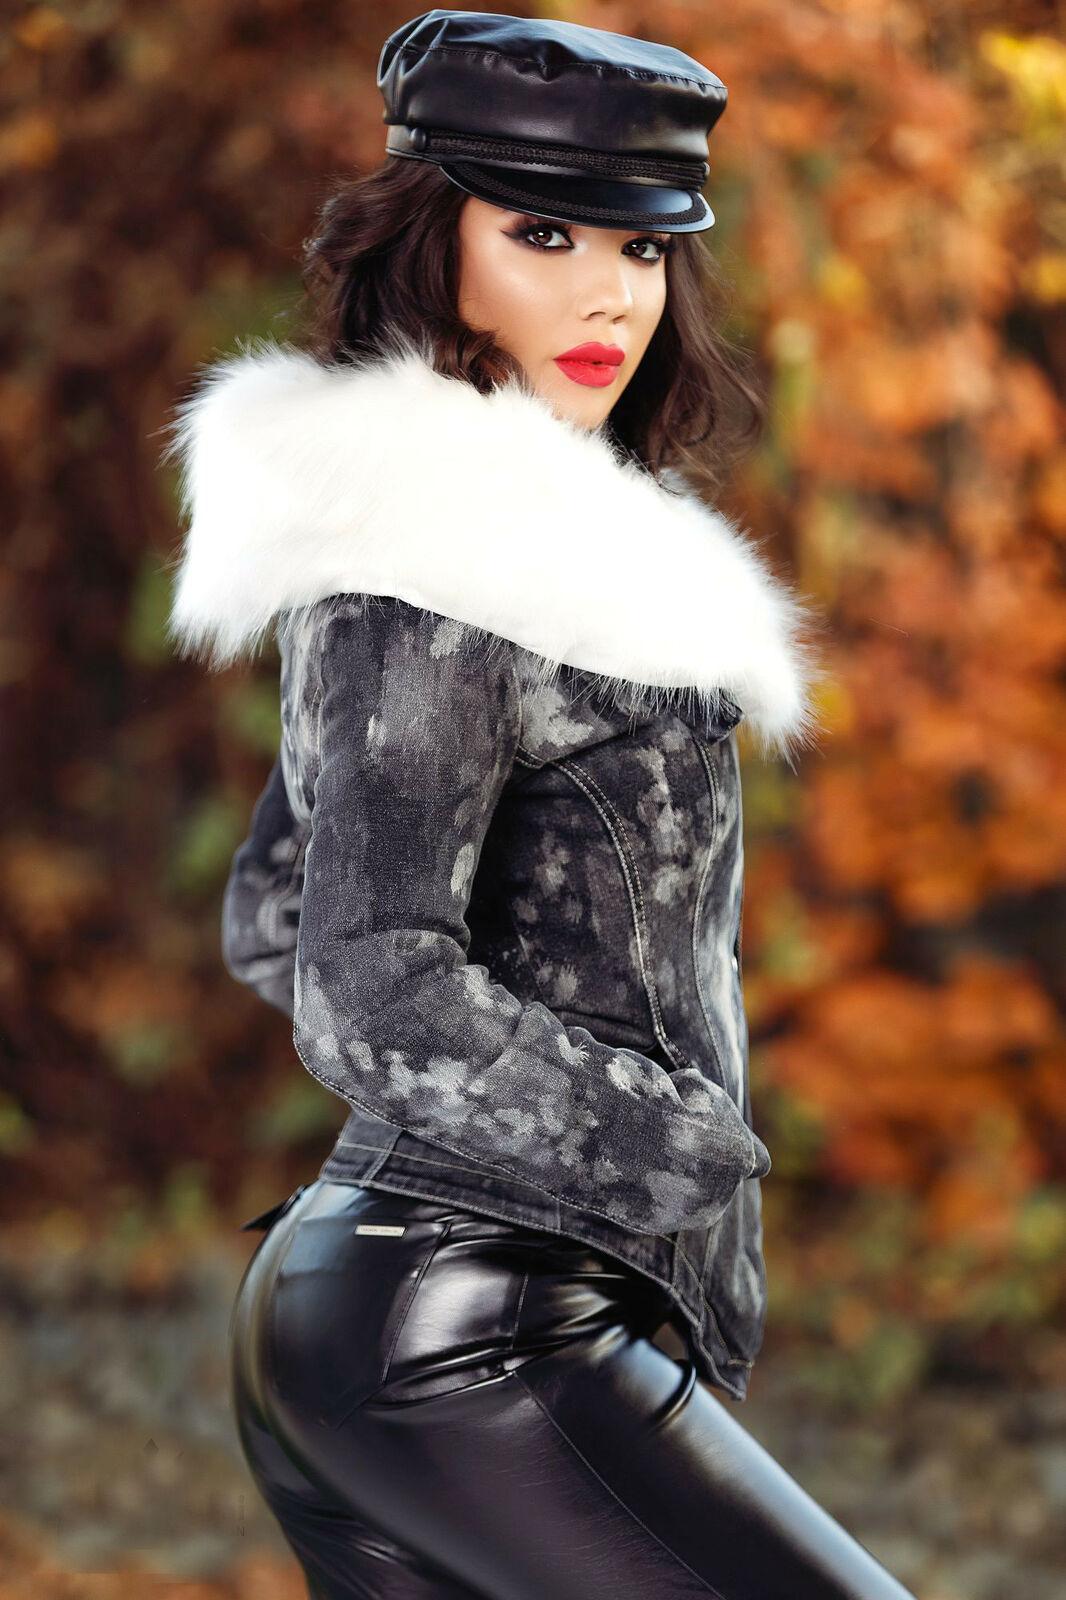 FOGGI Damenjacke Blazer Mantel gefütterte Übergangsjacke Felljacke 34-40 #F624